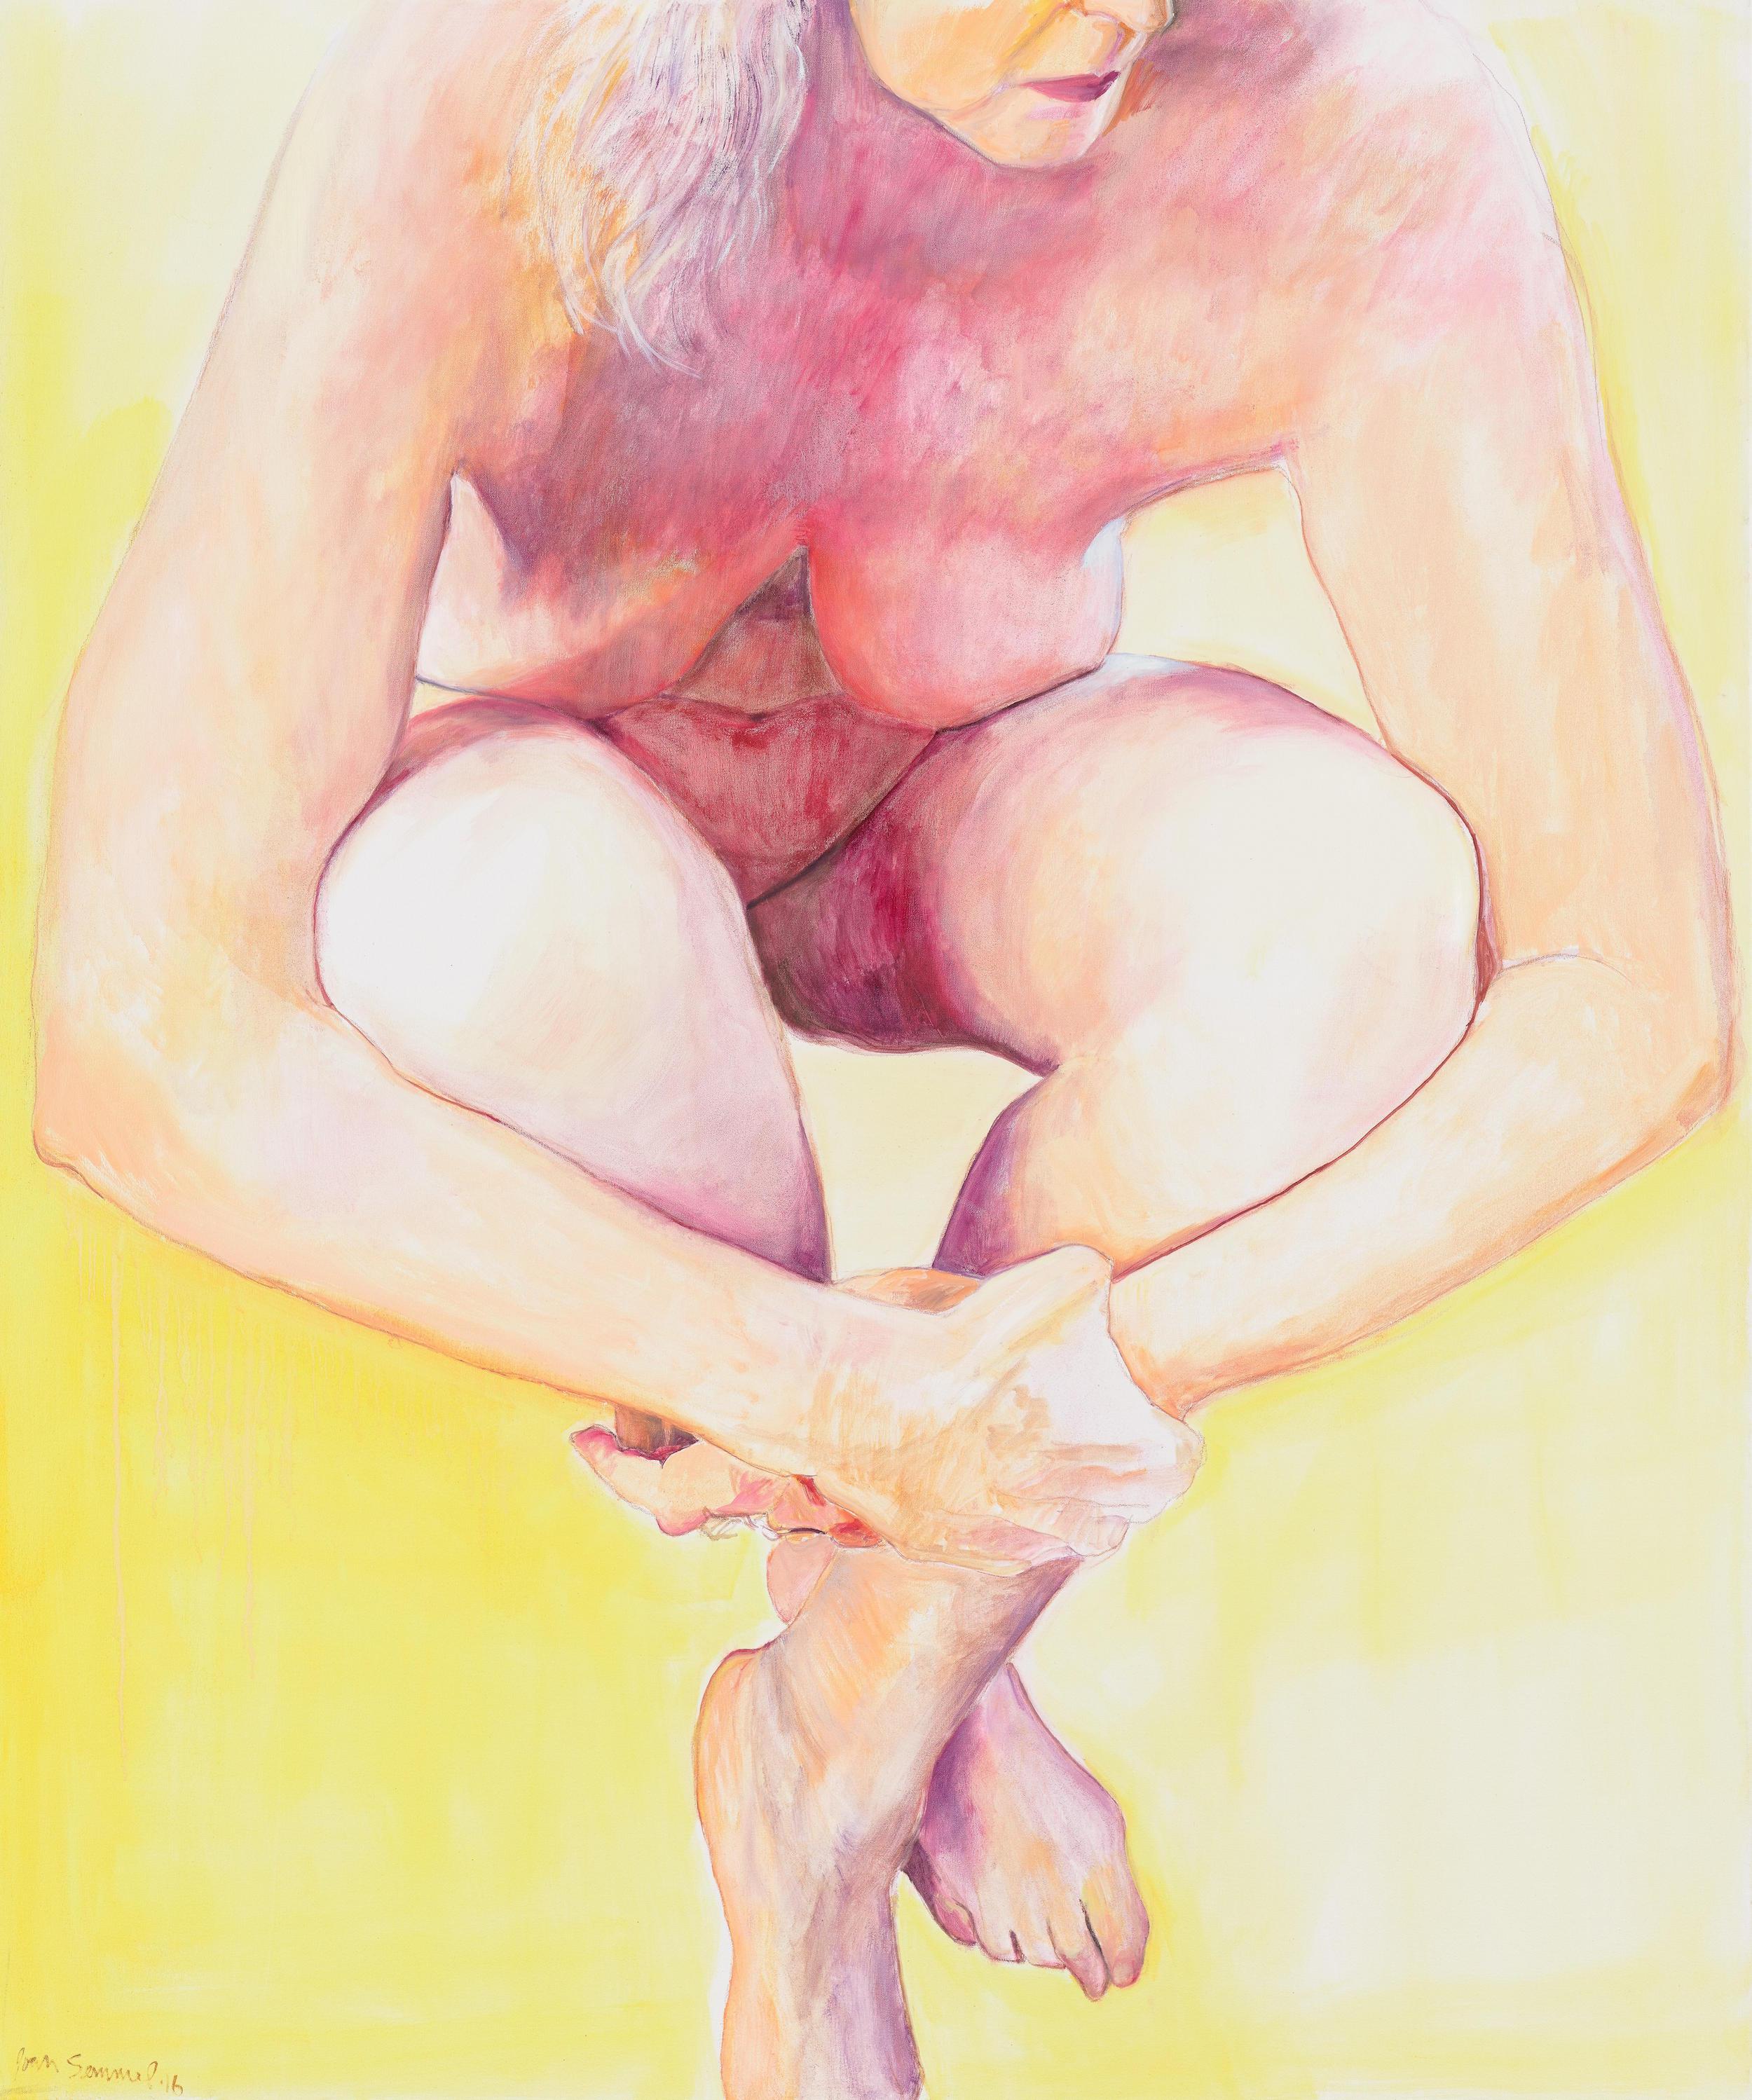 Joan Semmel, Embrace, 2016, Oil on canvas, 72 x 60 in, (182.88h x 152.4w cm) Courtesy Alexander Gray Associates, New York © 2016 Joan Semmel/Artists Rights Society (ARS), New York